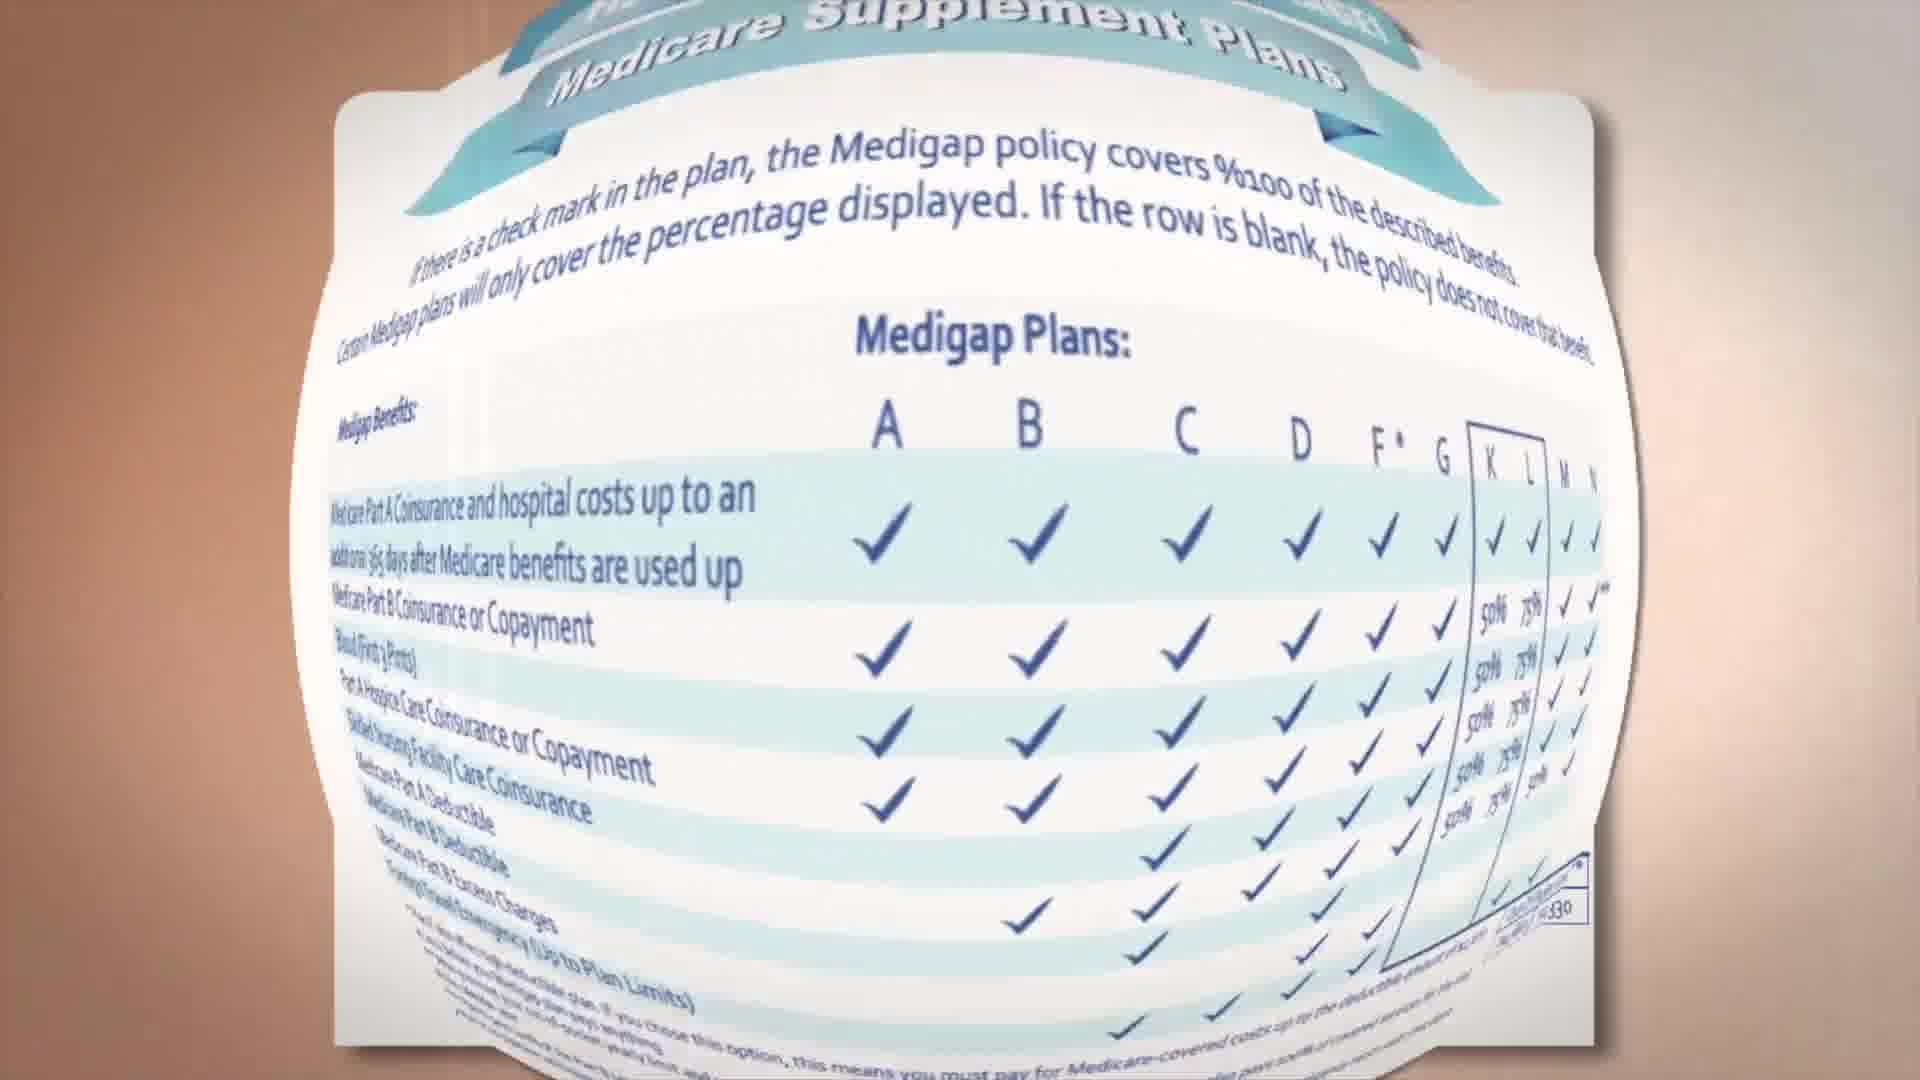 Top medigap plans